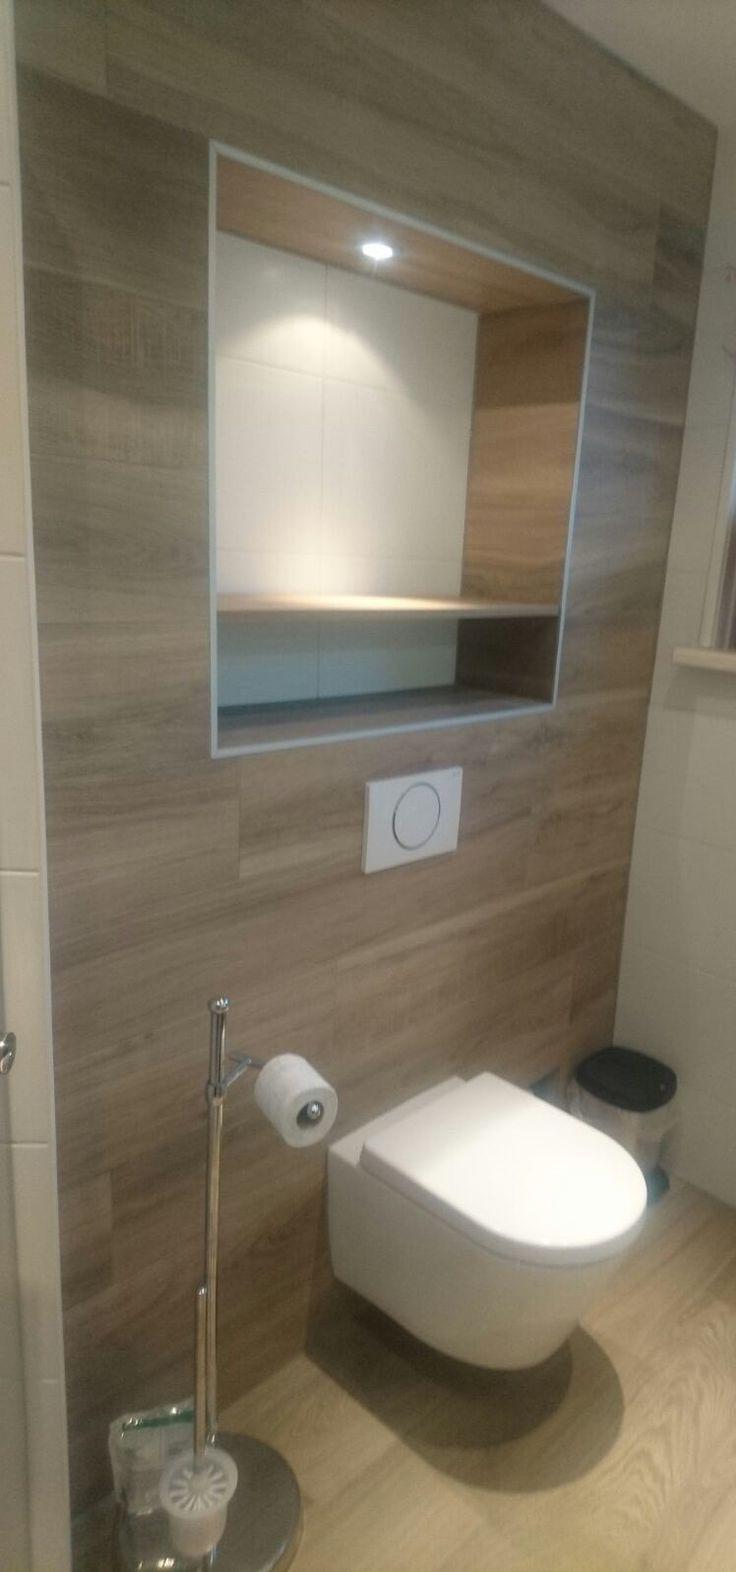 25 beste idee n over douche planken op pinterest douche opslag douches en douche niche - Wanddecoratie badkamertegels ...